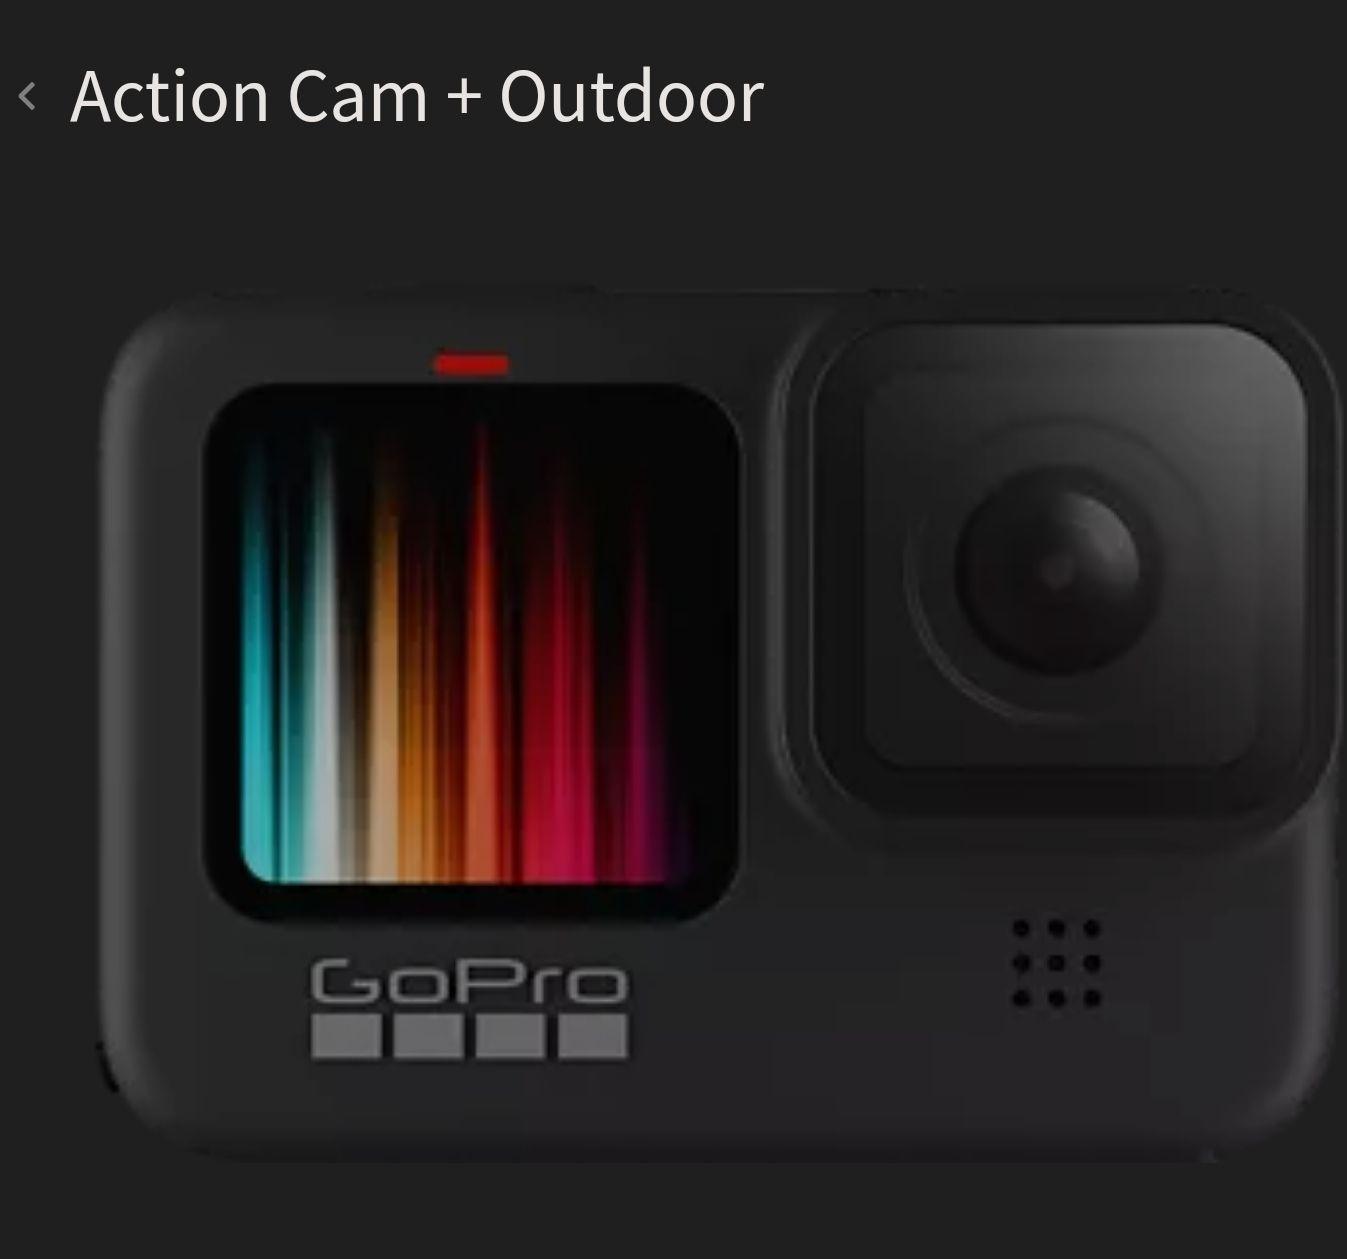 GOPRO Hero9 Black Action Cam